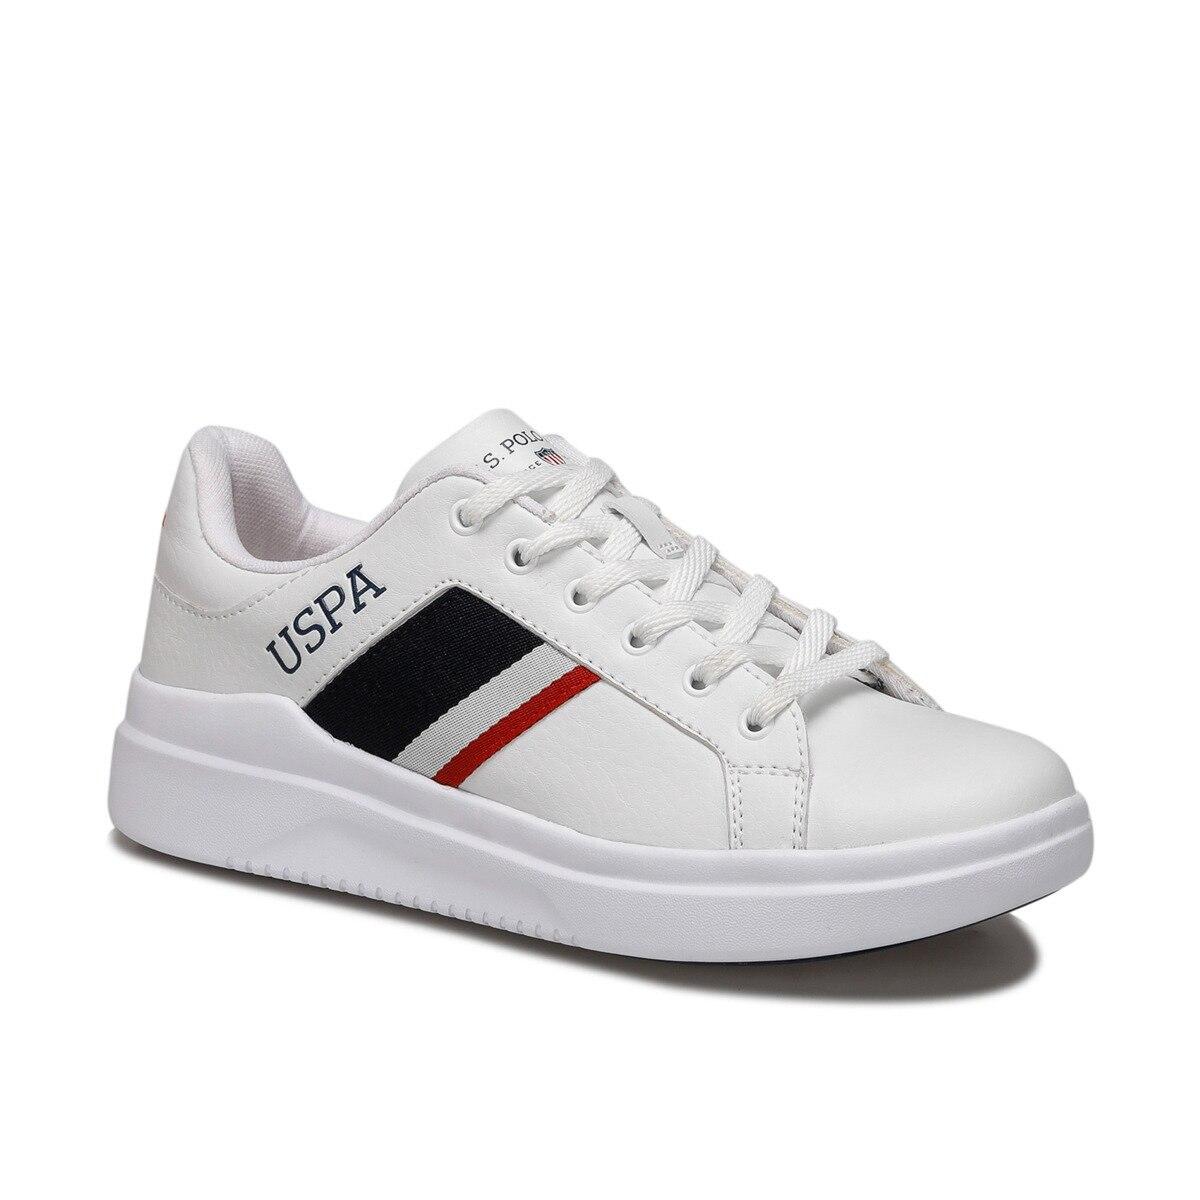 FLO CAMEL 9PR White Women 'S Sneaker Shoes U.S. POLO ASSN.